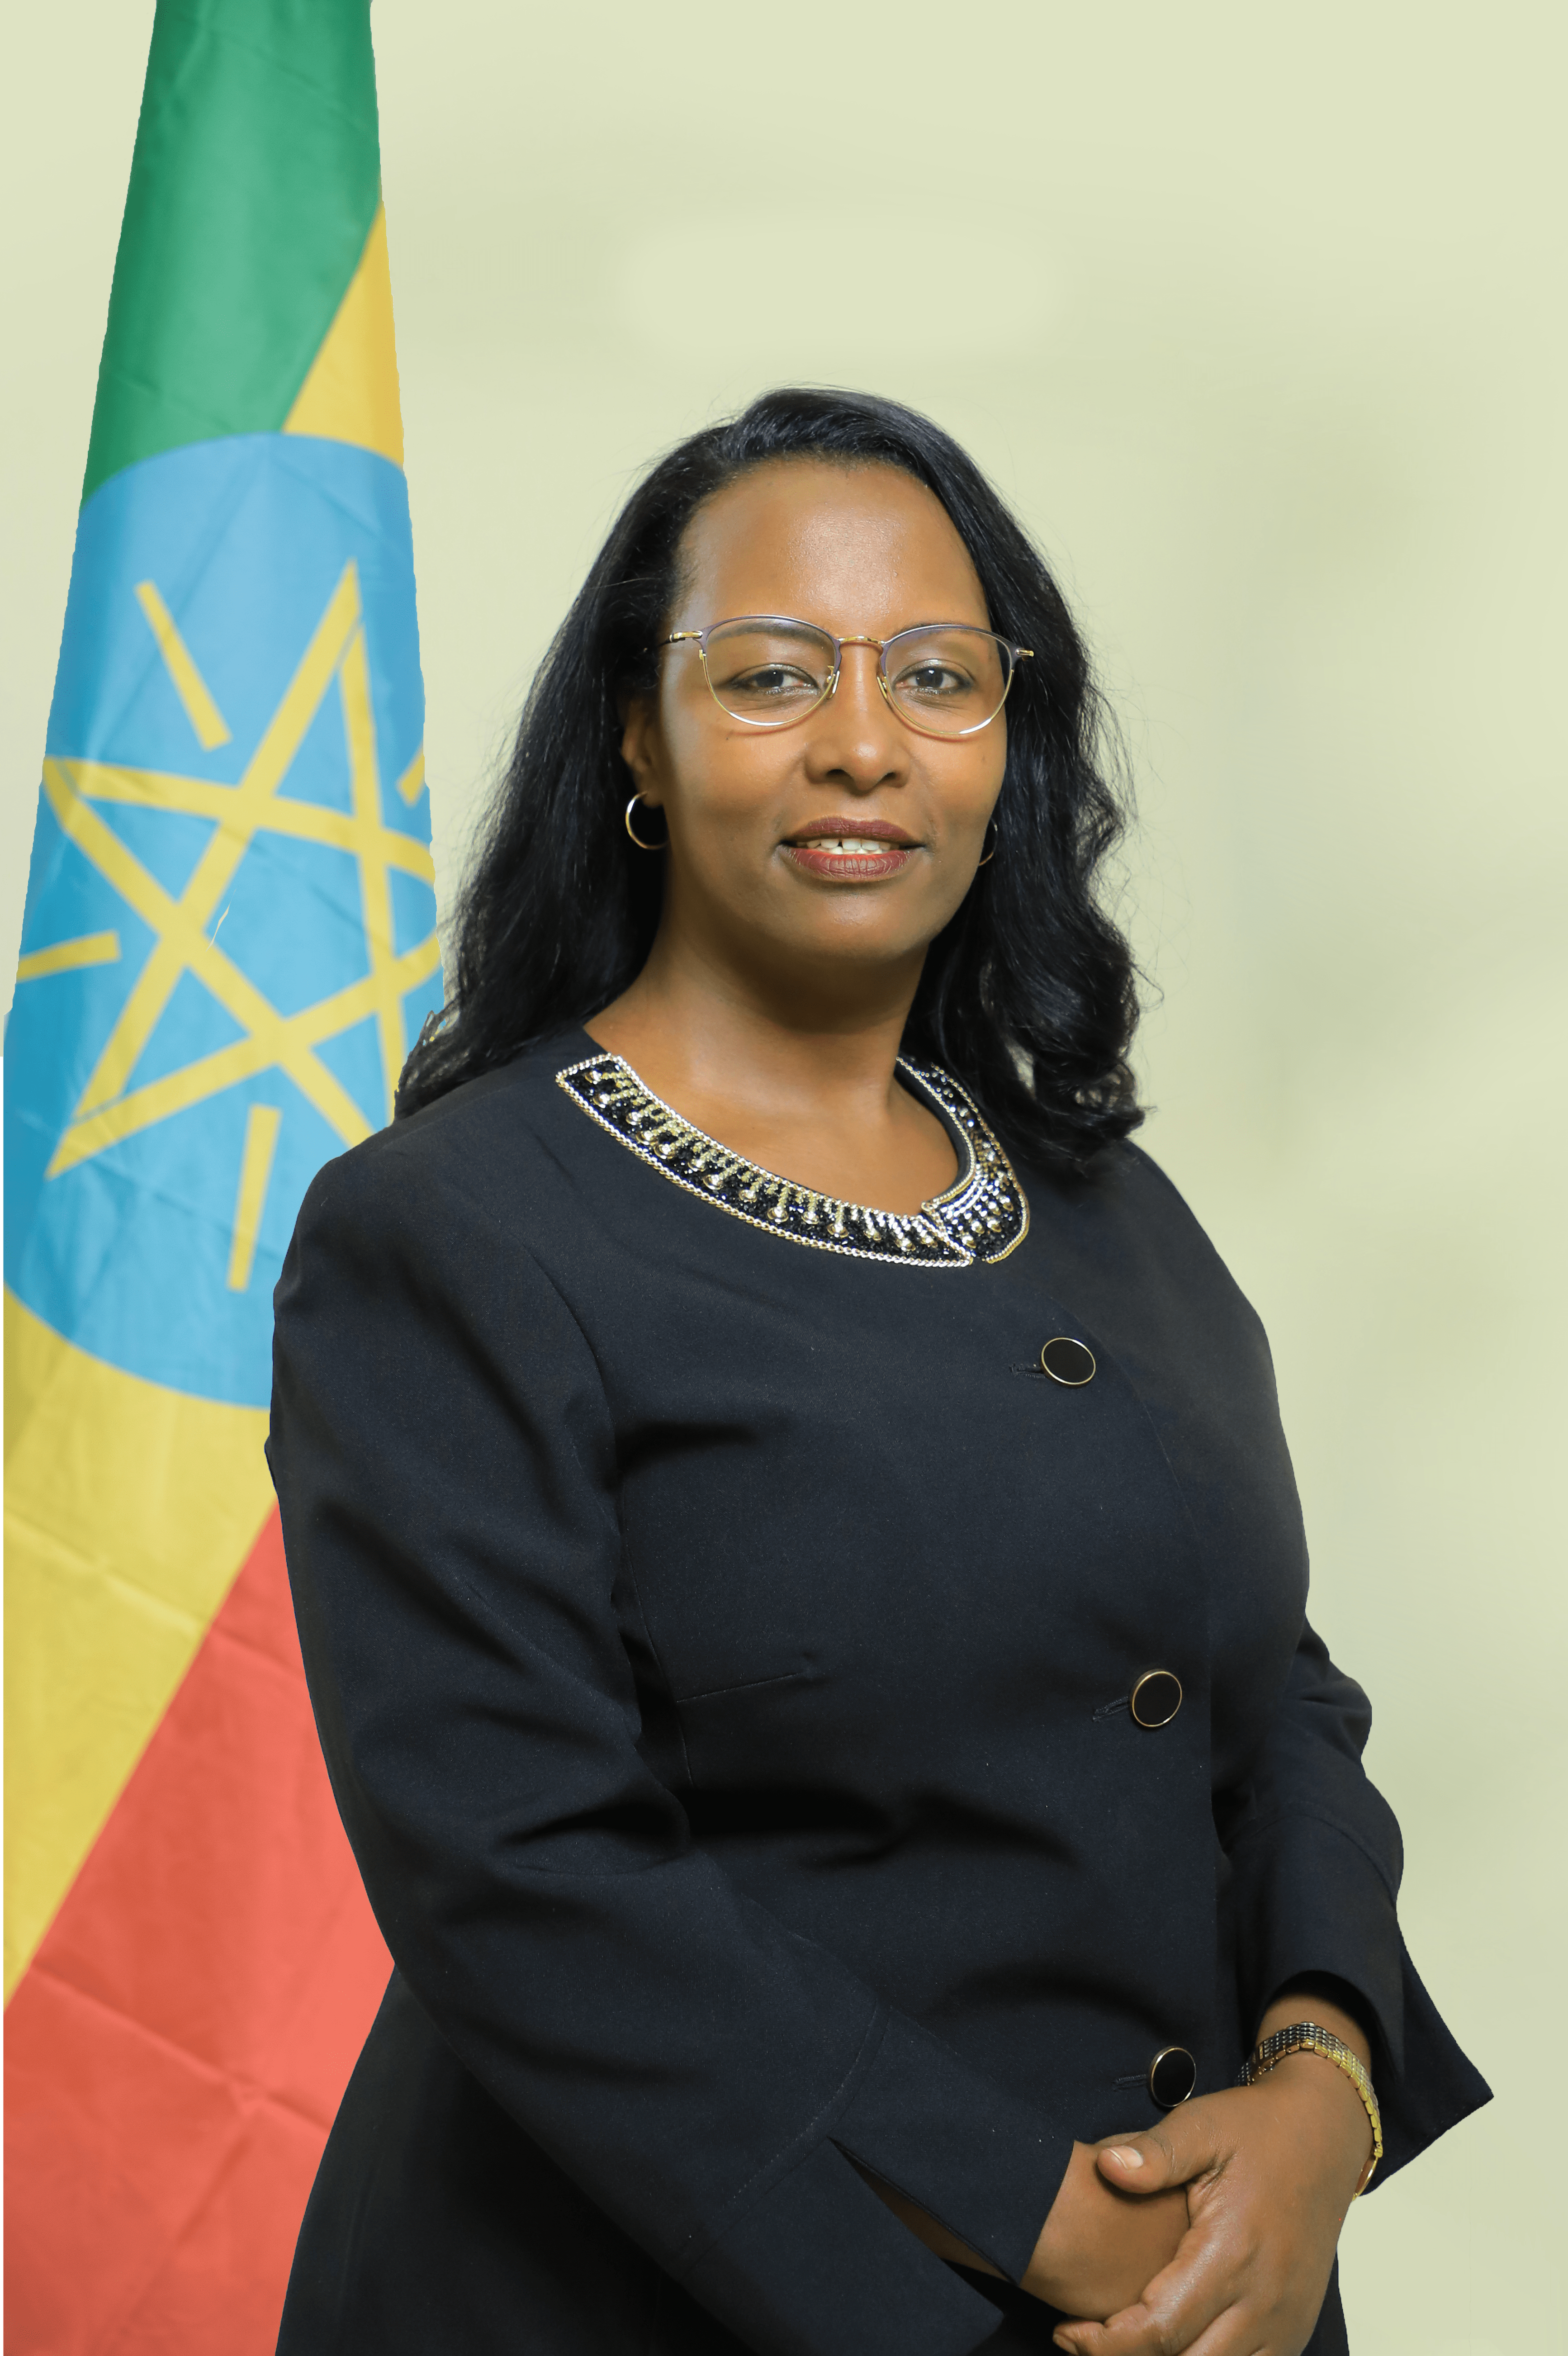 Adanech Abebe